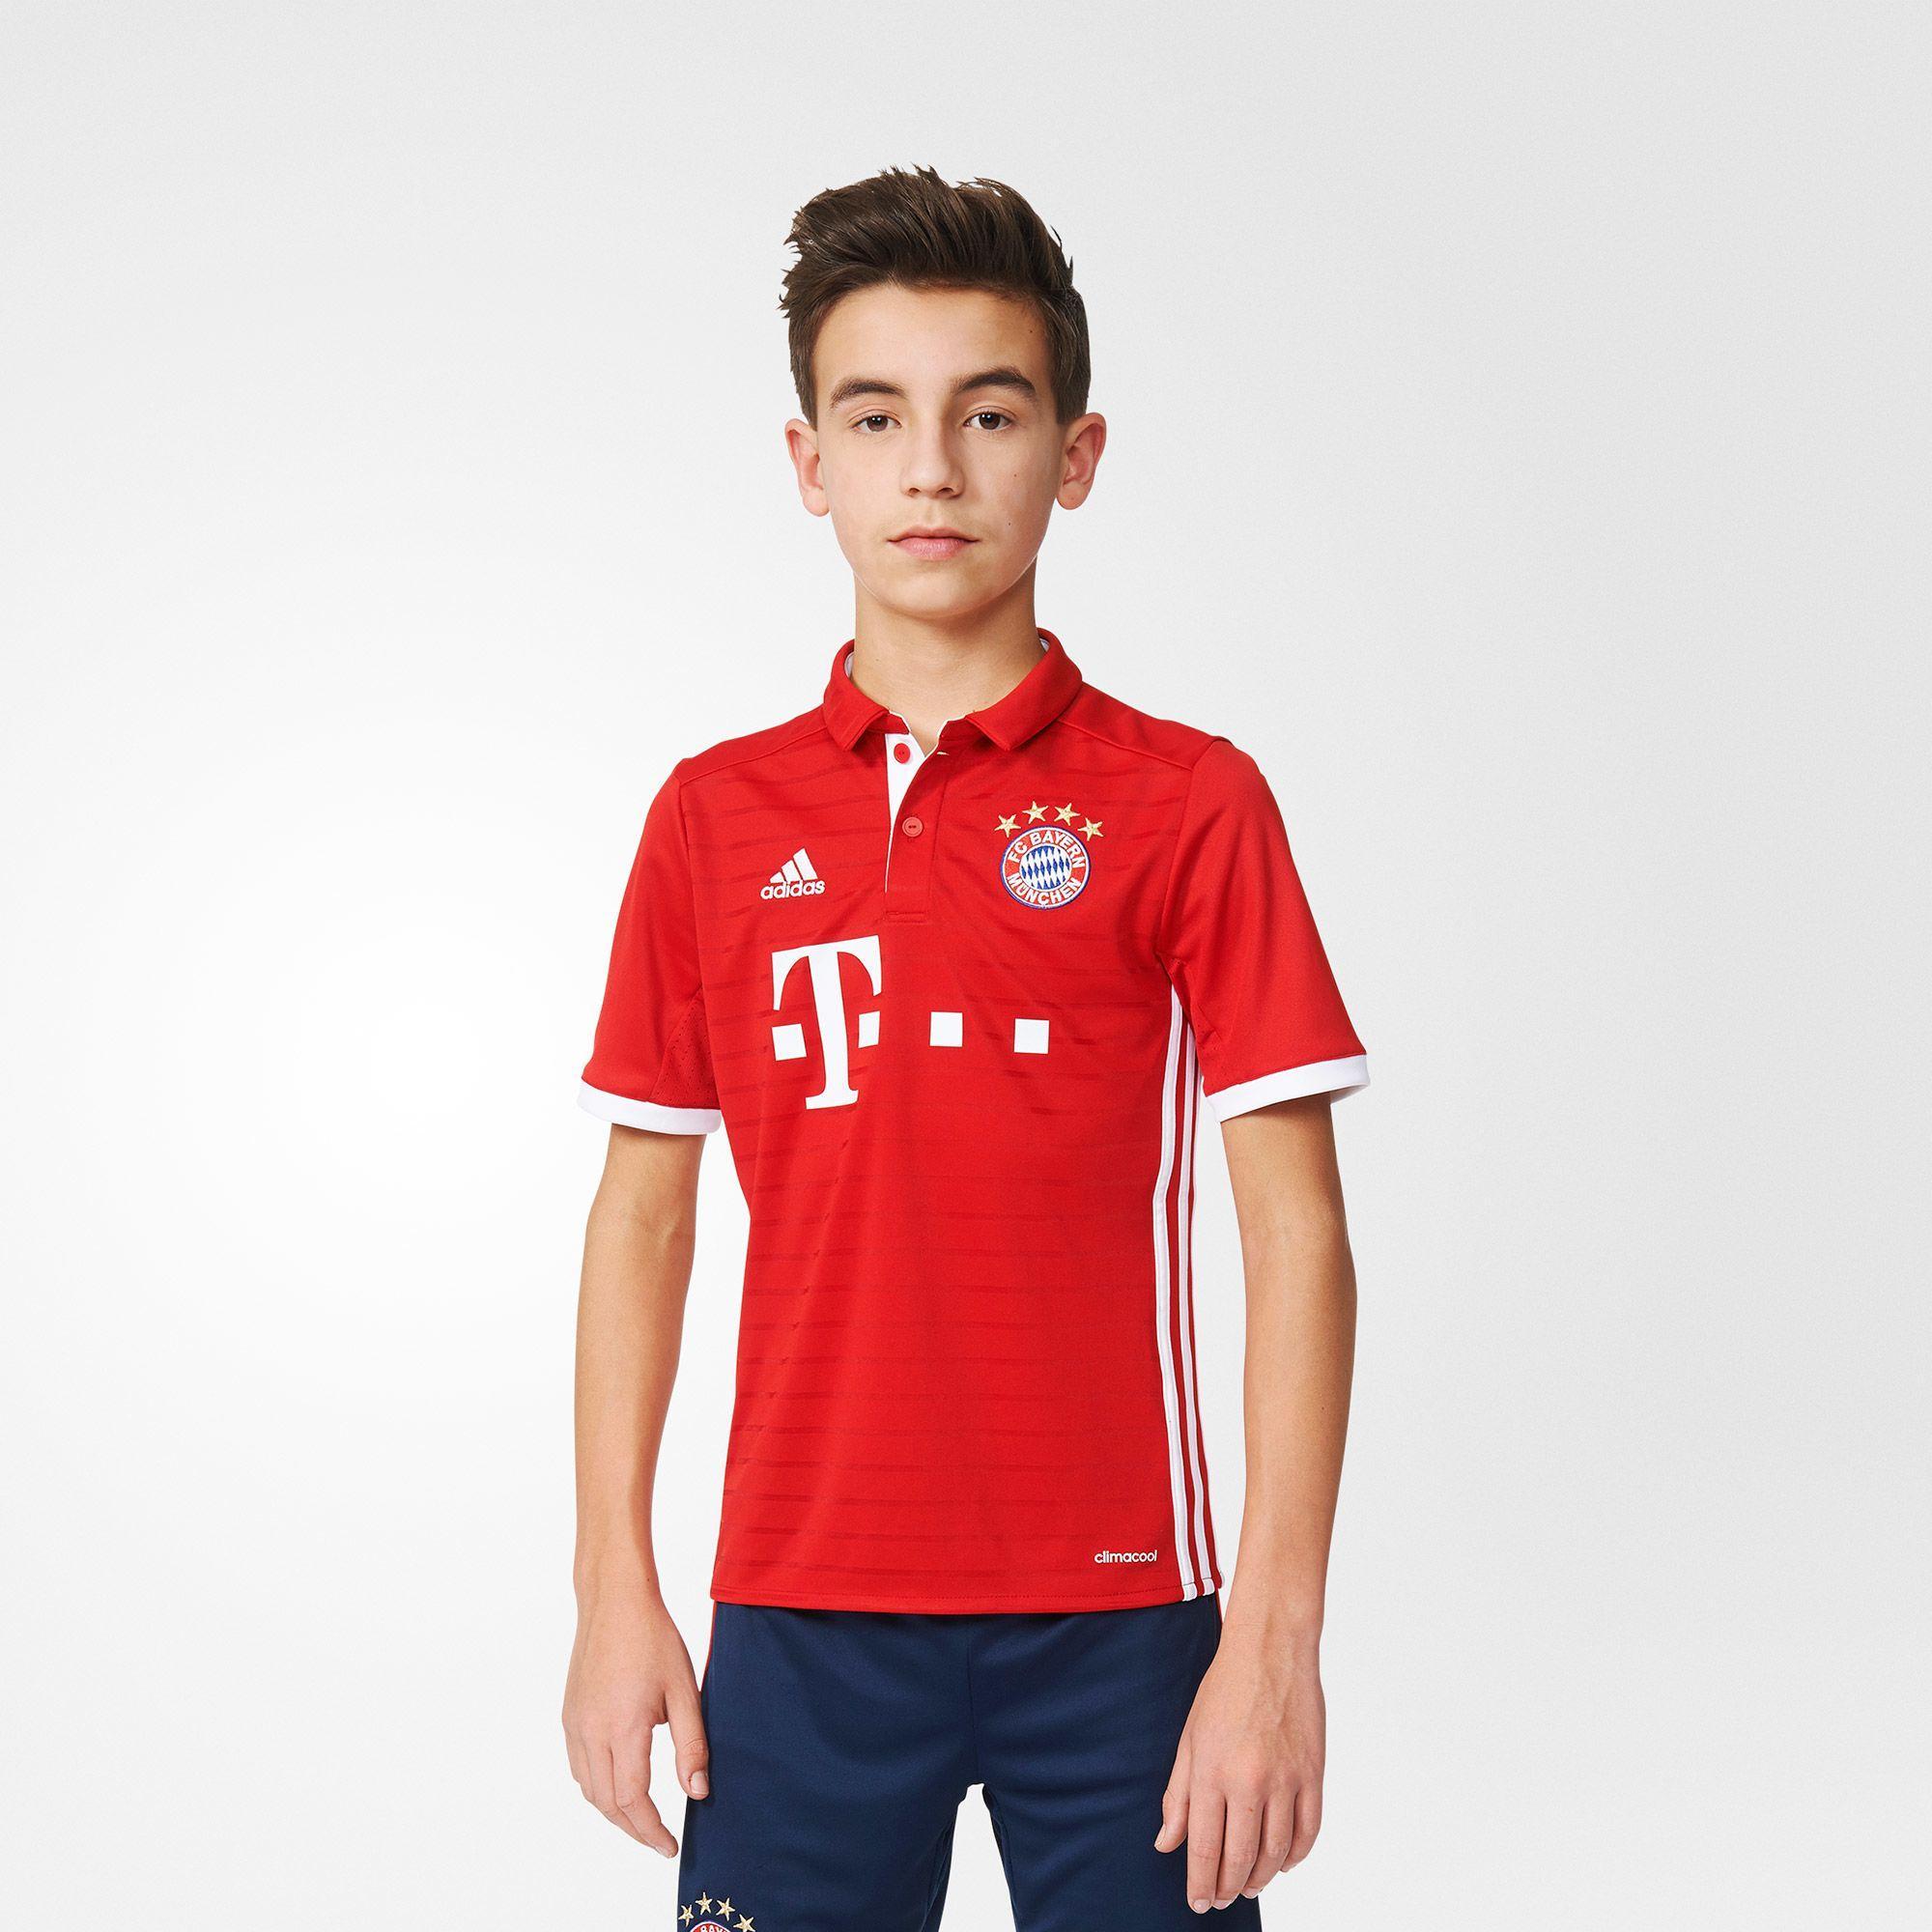 Kinder FC Bayern München Heimtrikot Replica, FCBTRU/WHITE, 164